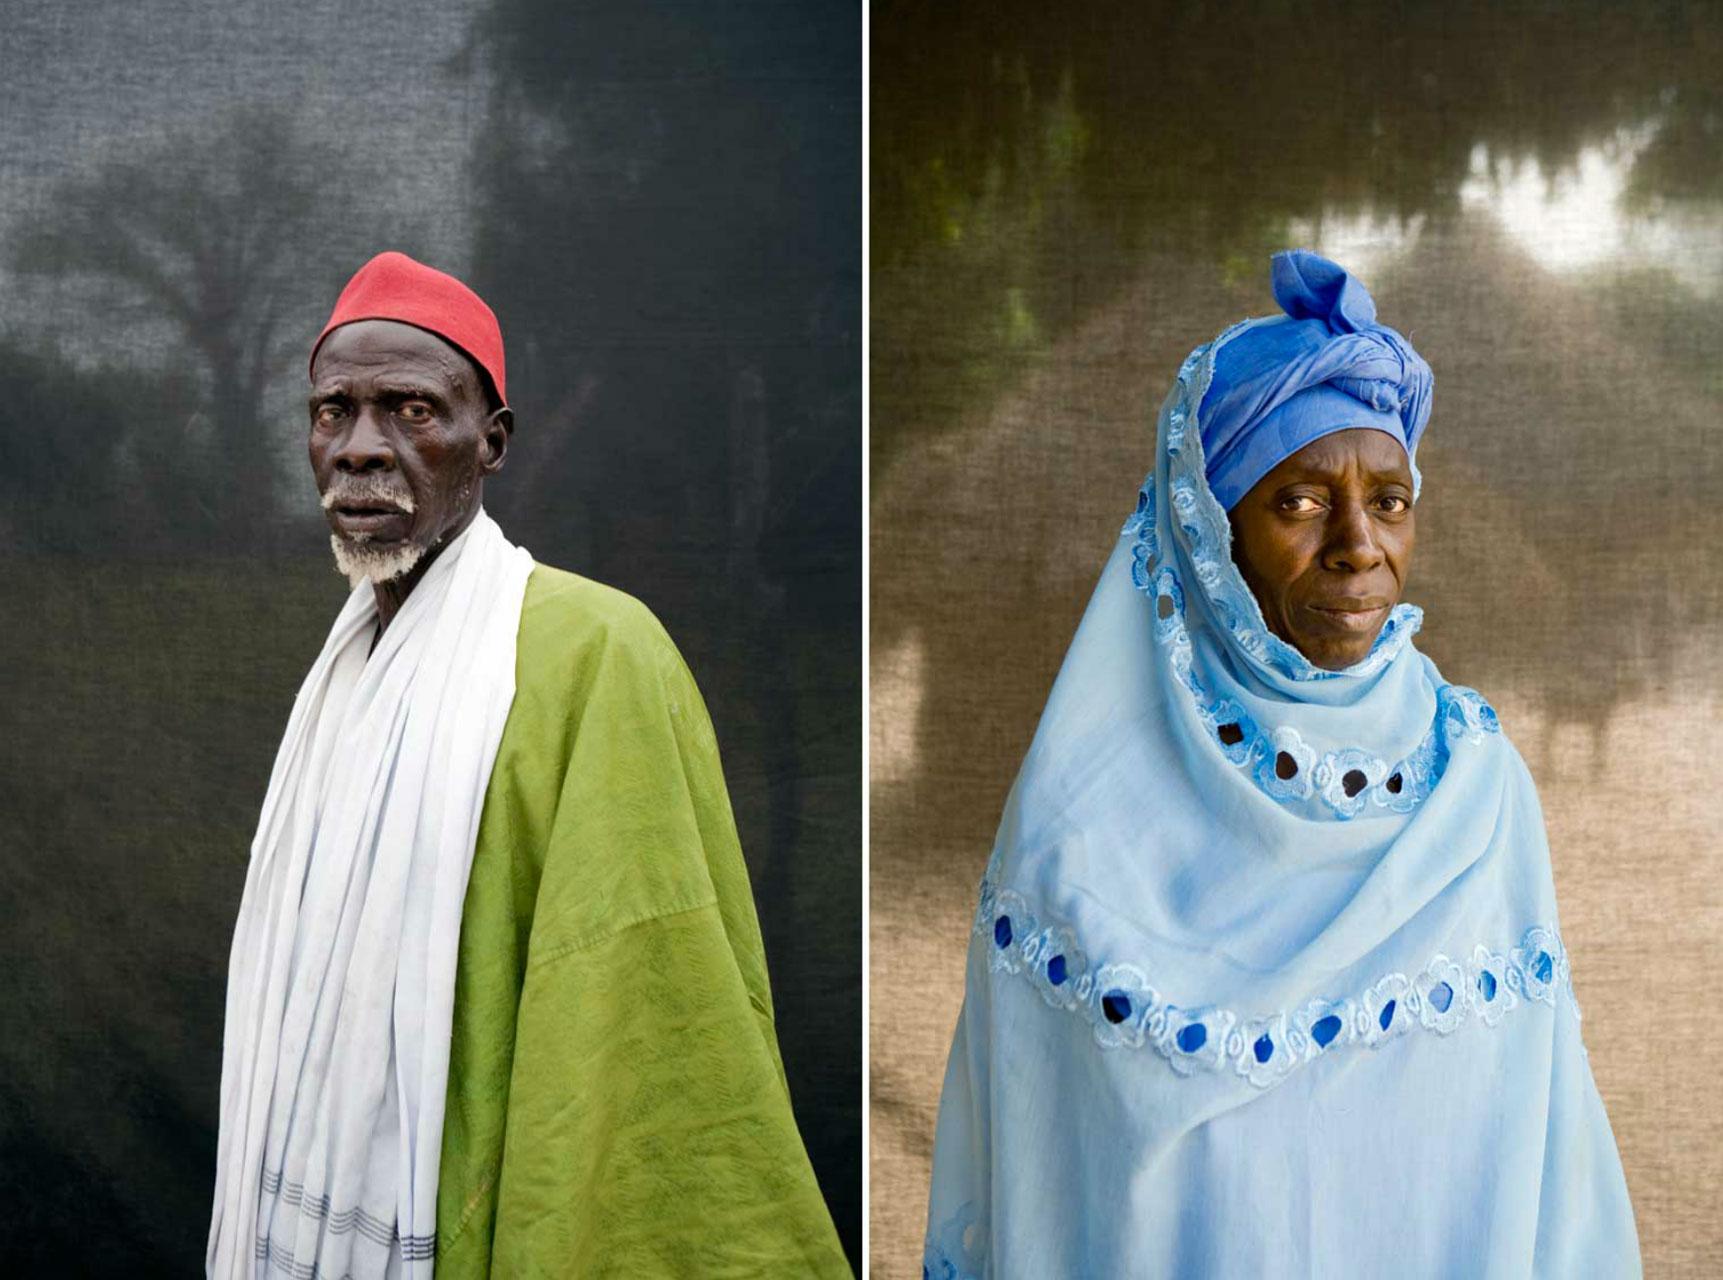 Portraits of Gambian Village Chiefs, Dam Sallah and Fatou Dansu, The Gambia, West Africa © Jason Florio